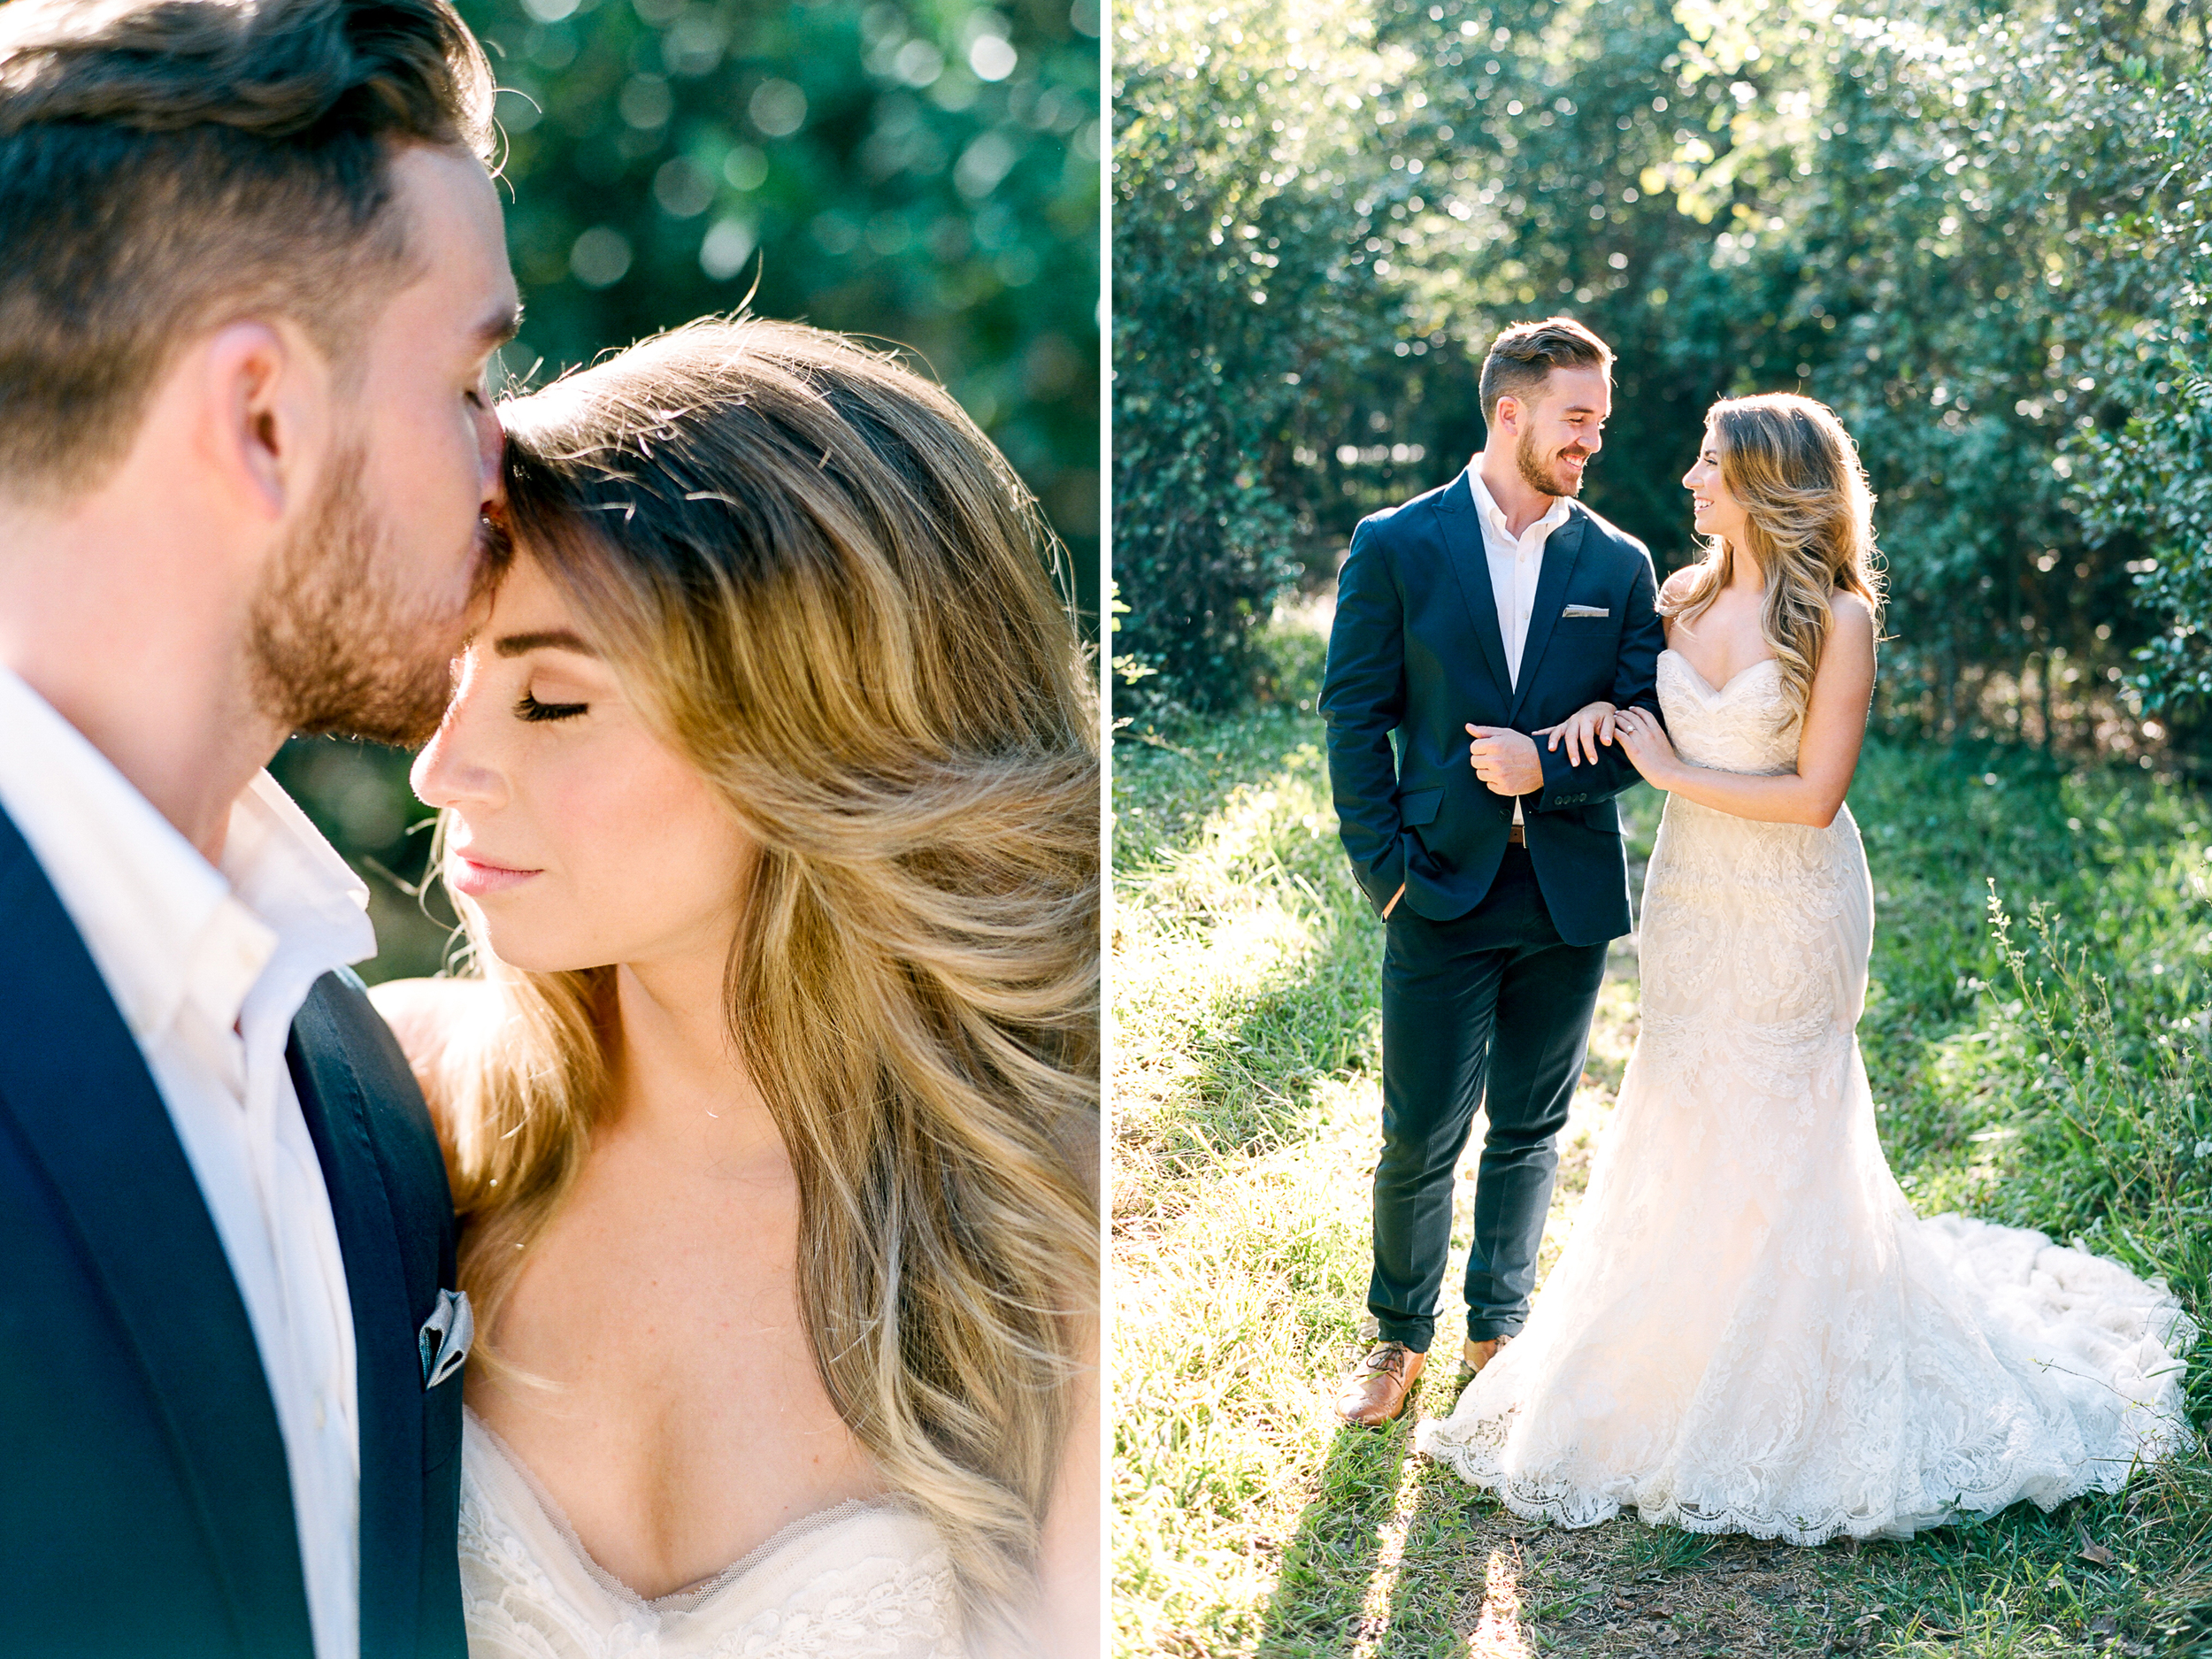 dana-fernandez-photography-the-wedding-chicks-film-houston-wedding-photography-destination-111.jpg